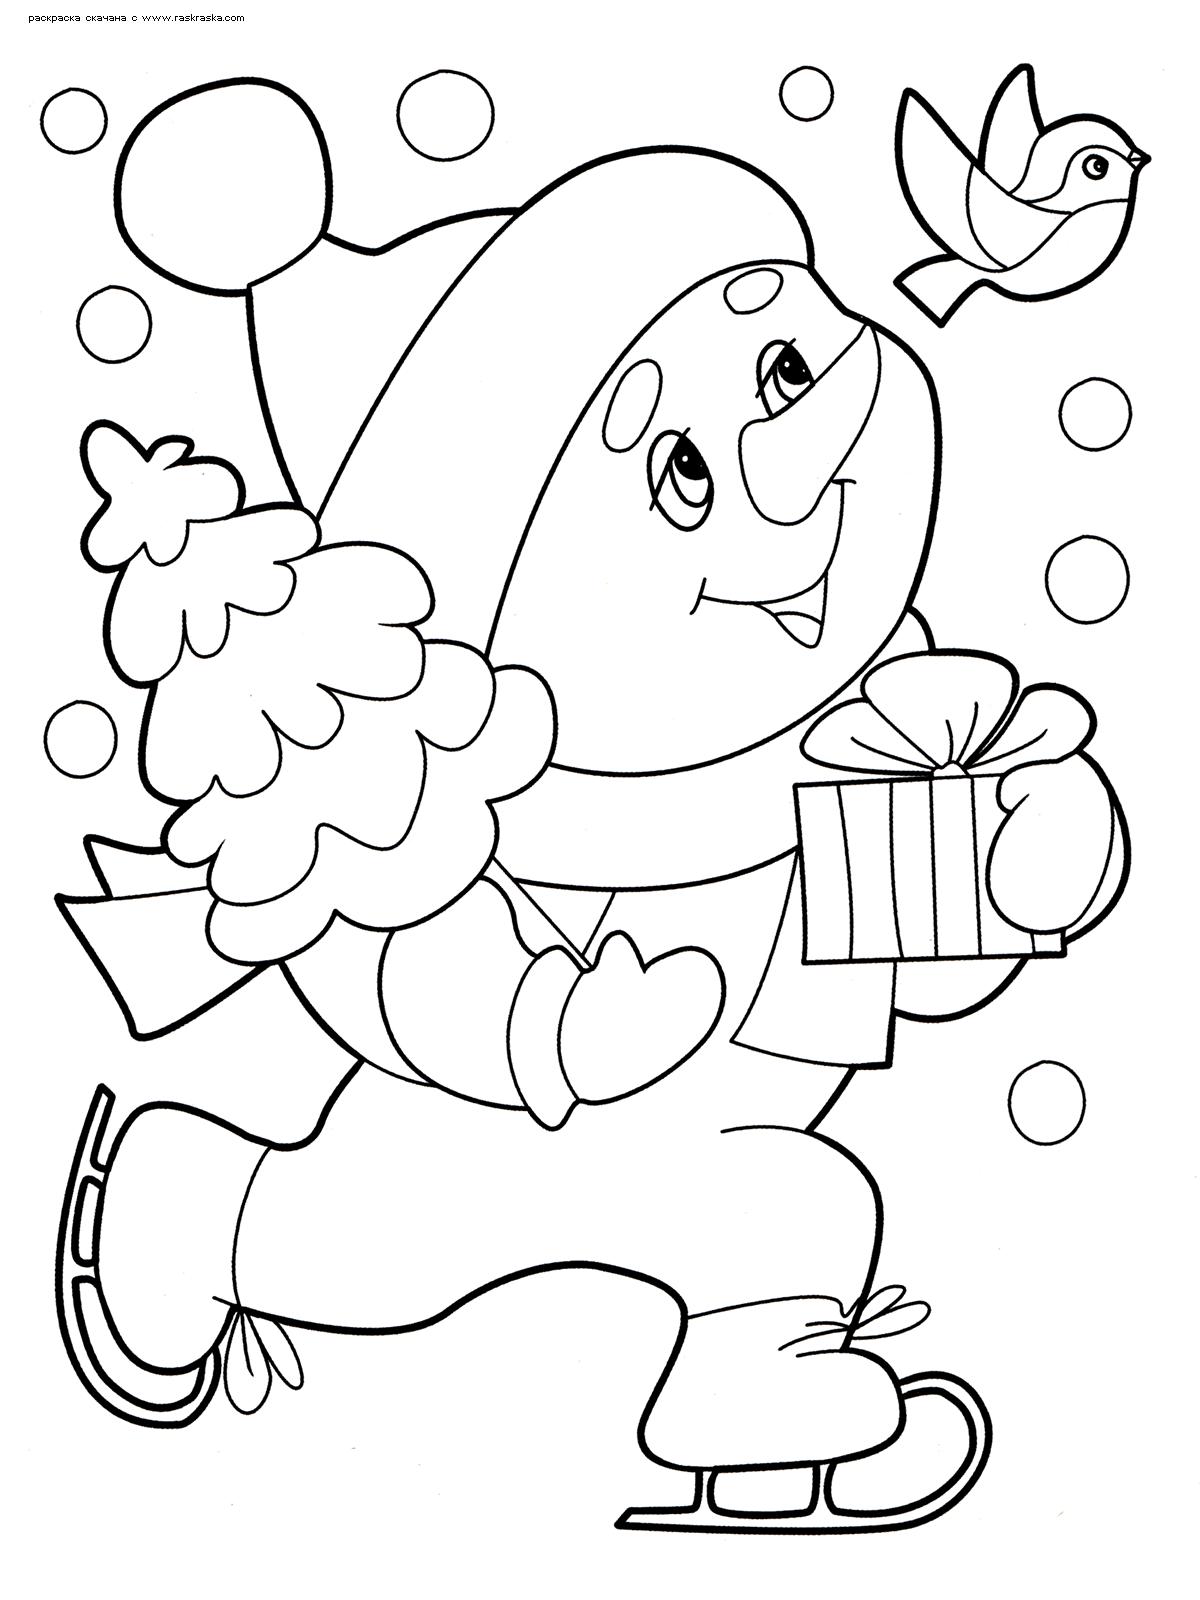 Раскраска Снеговик с подарком. Раскраска снеговик, новый год, зима